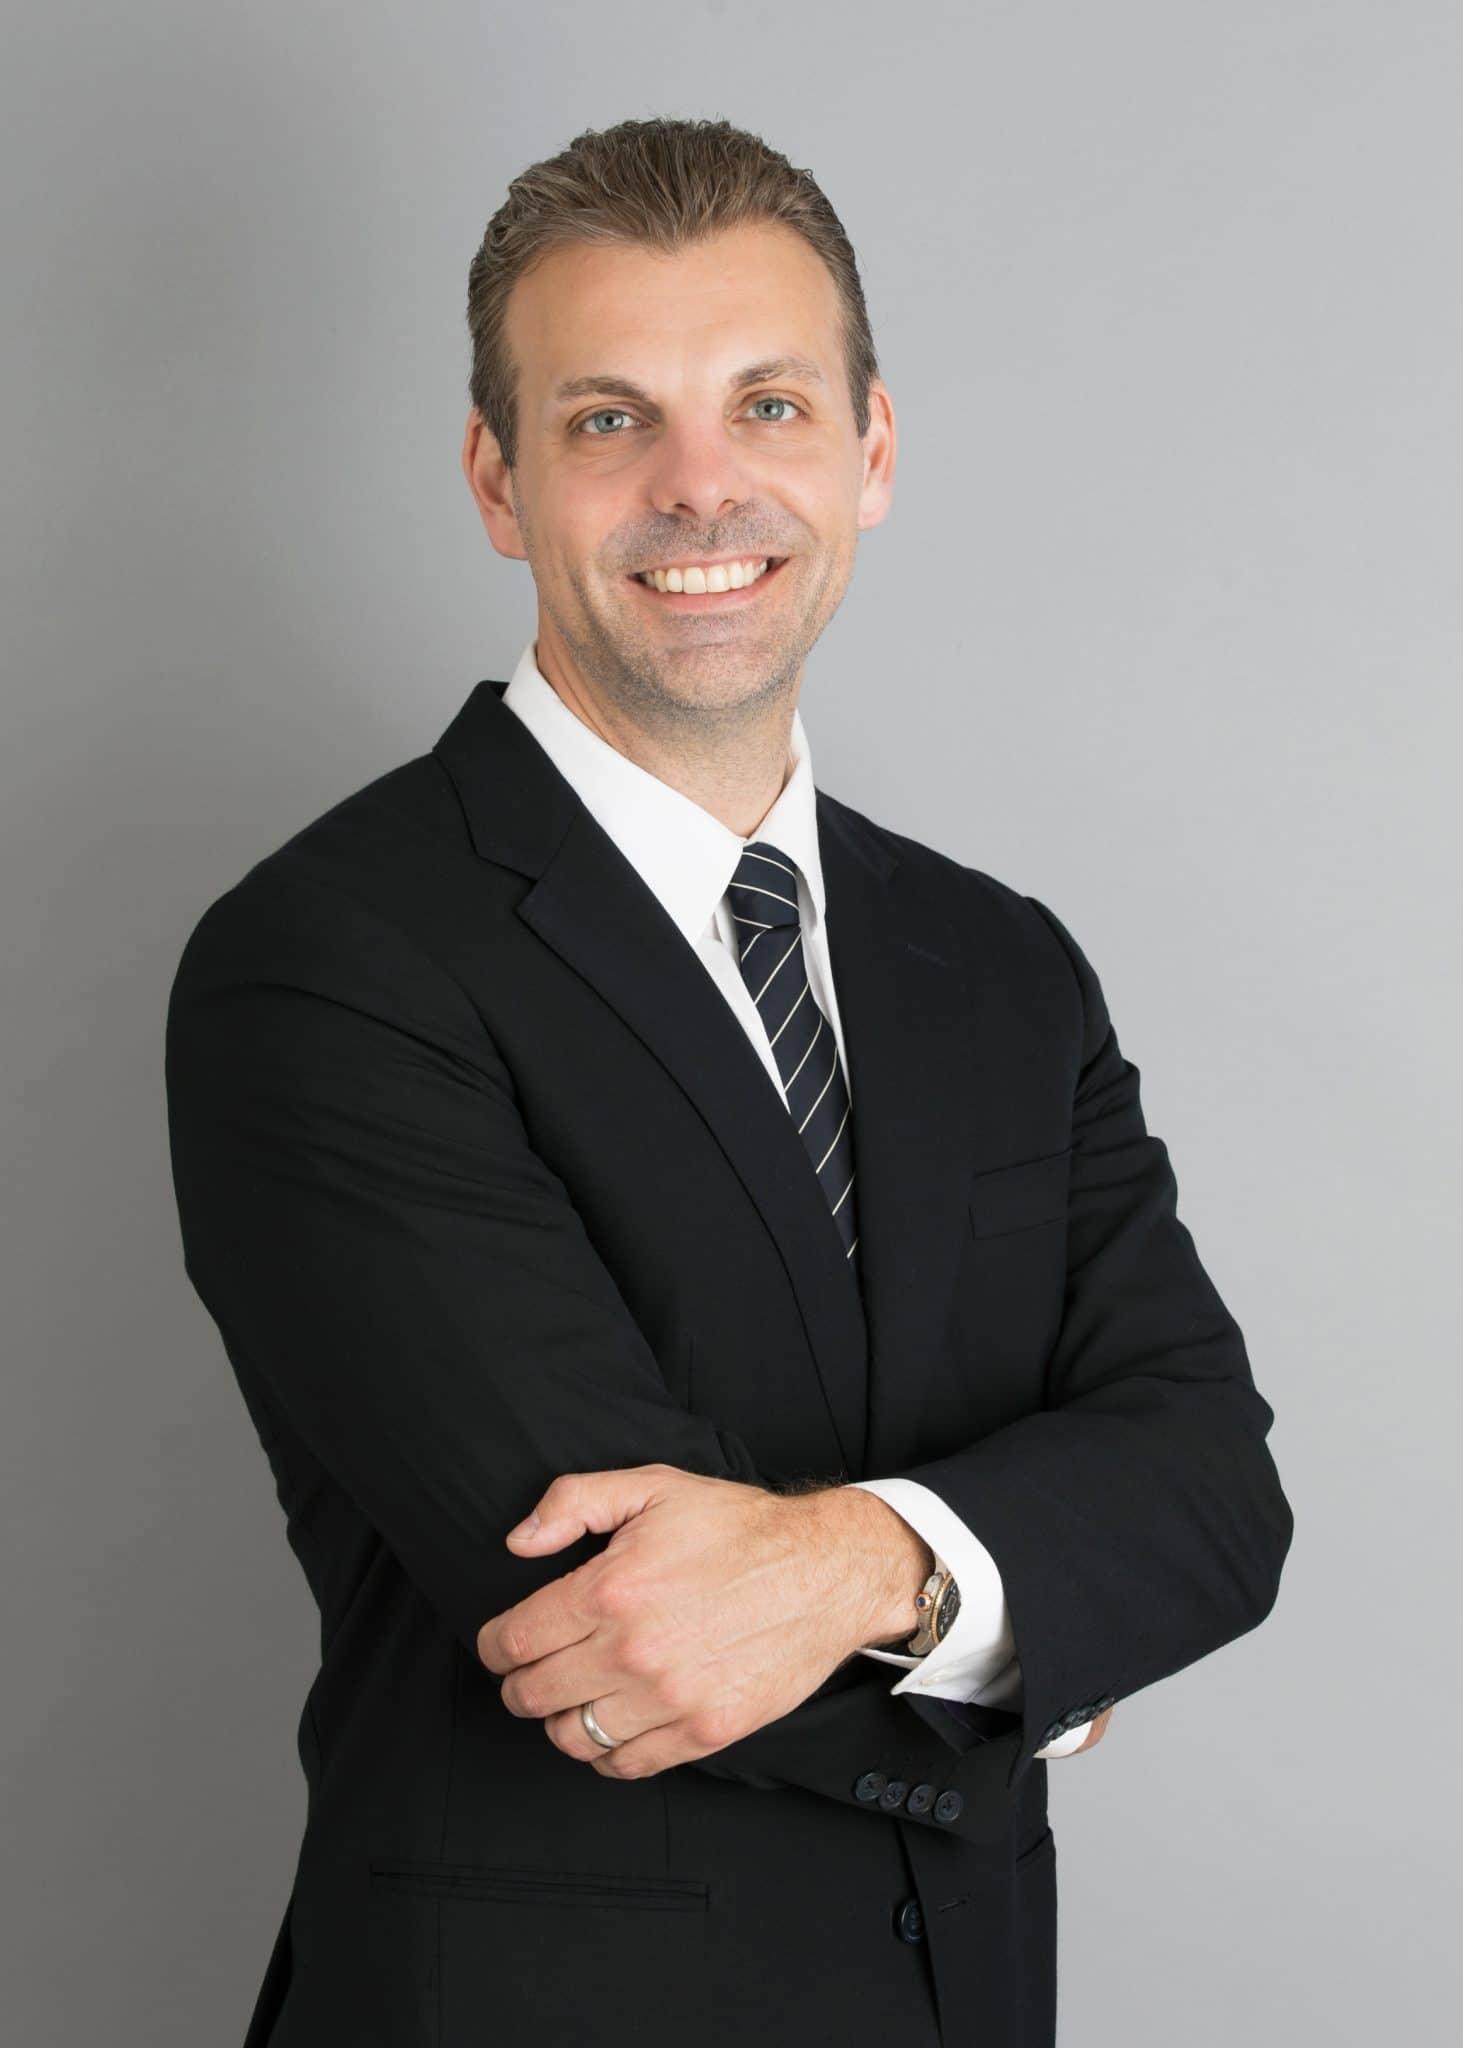 Jim Quinn Plethora